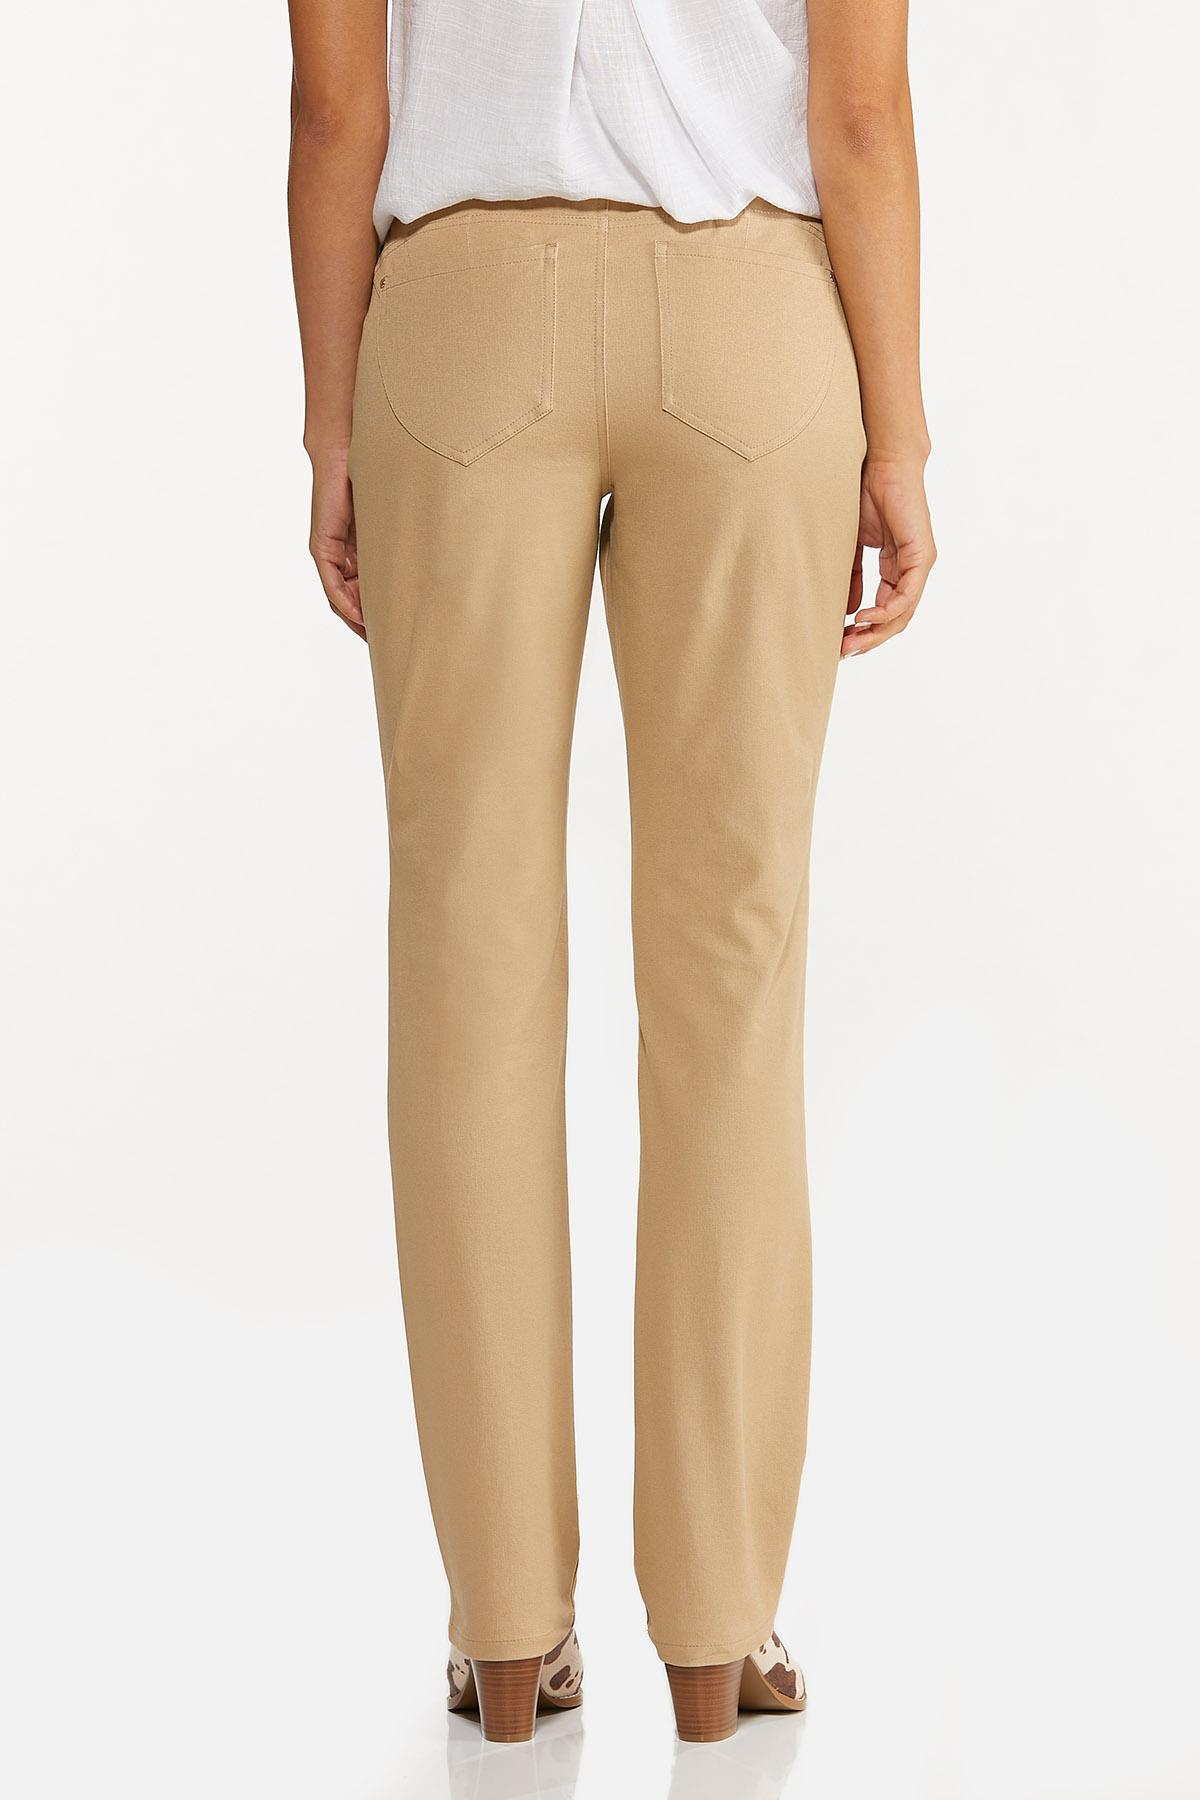 Petite Curvy Getaway Pants (Item #44657830)